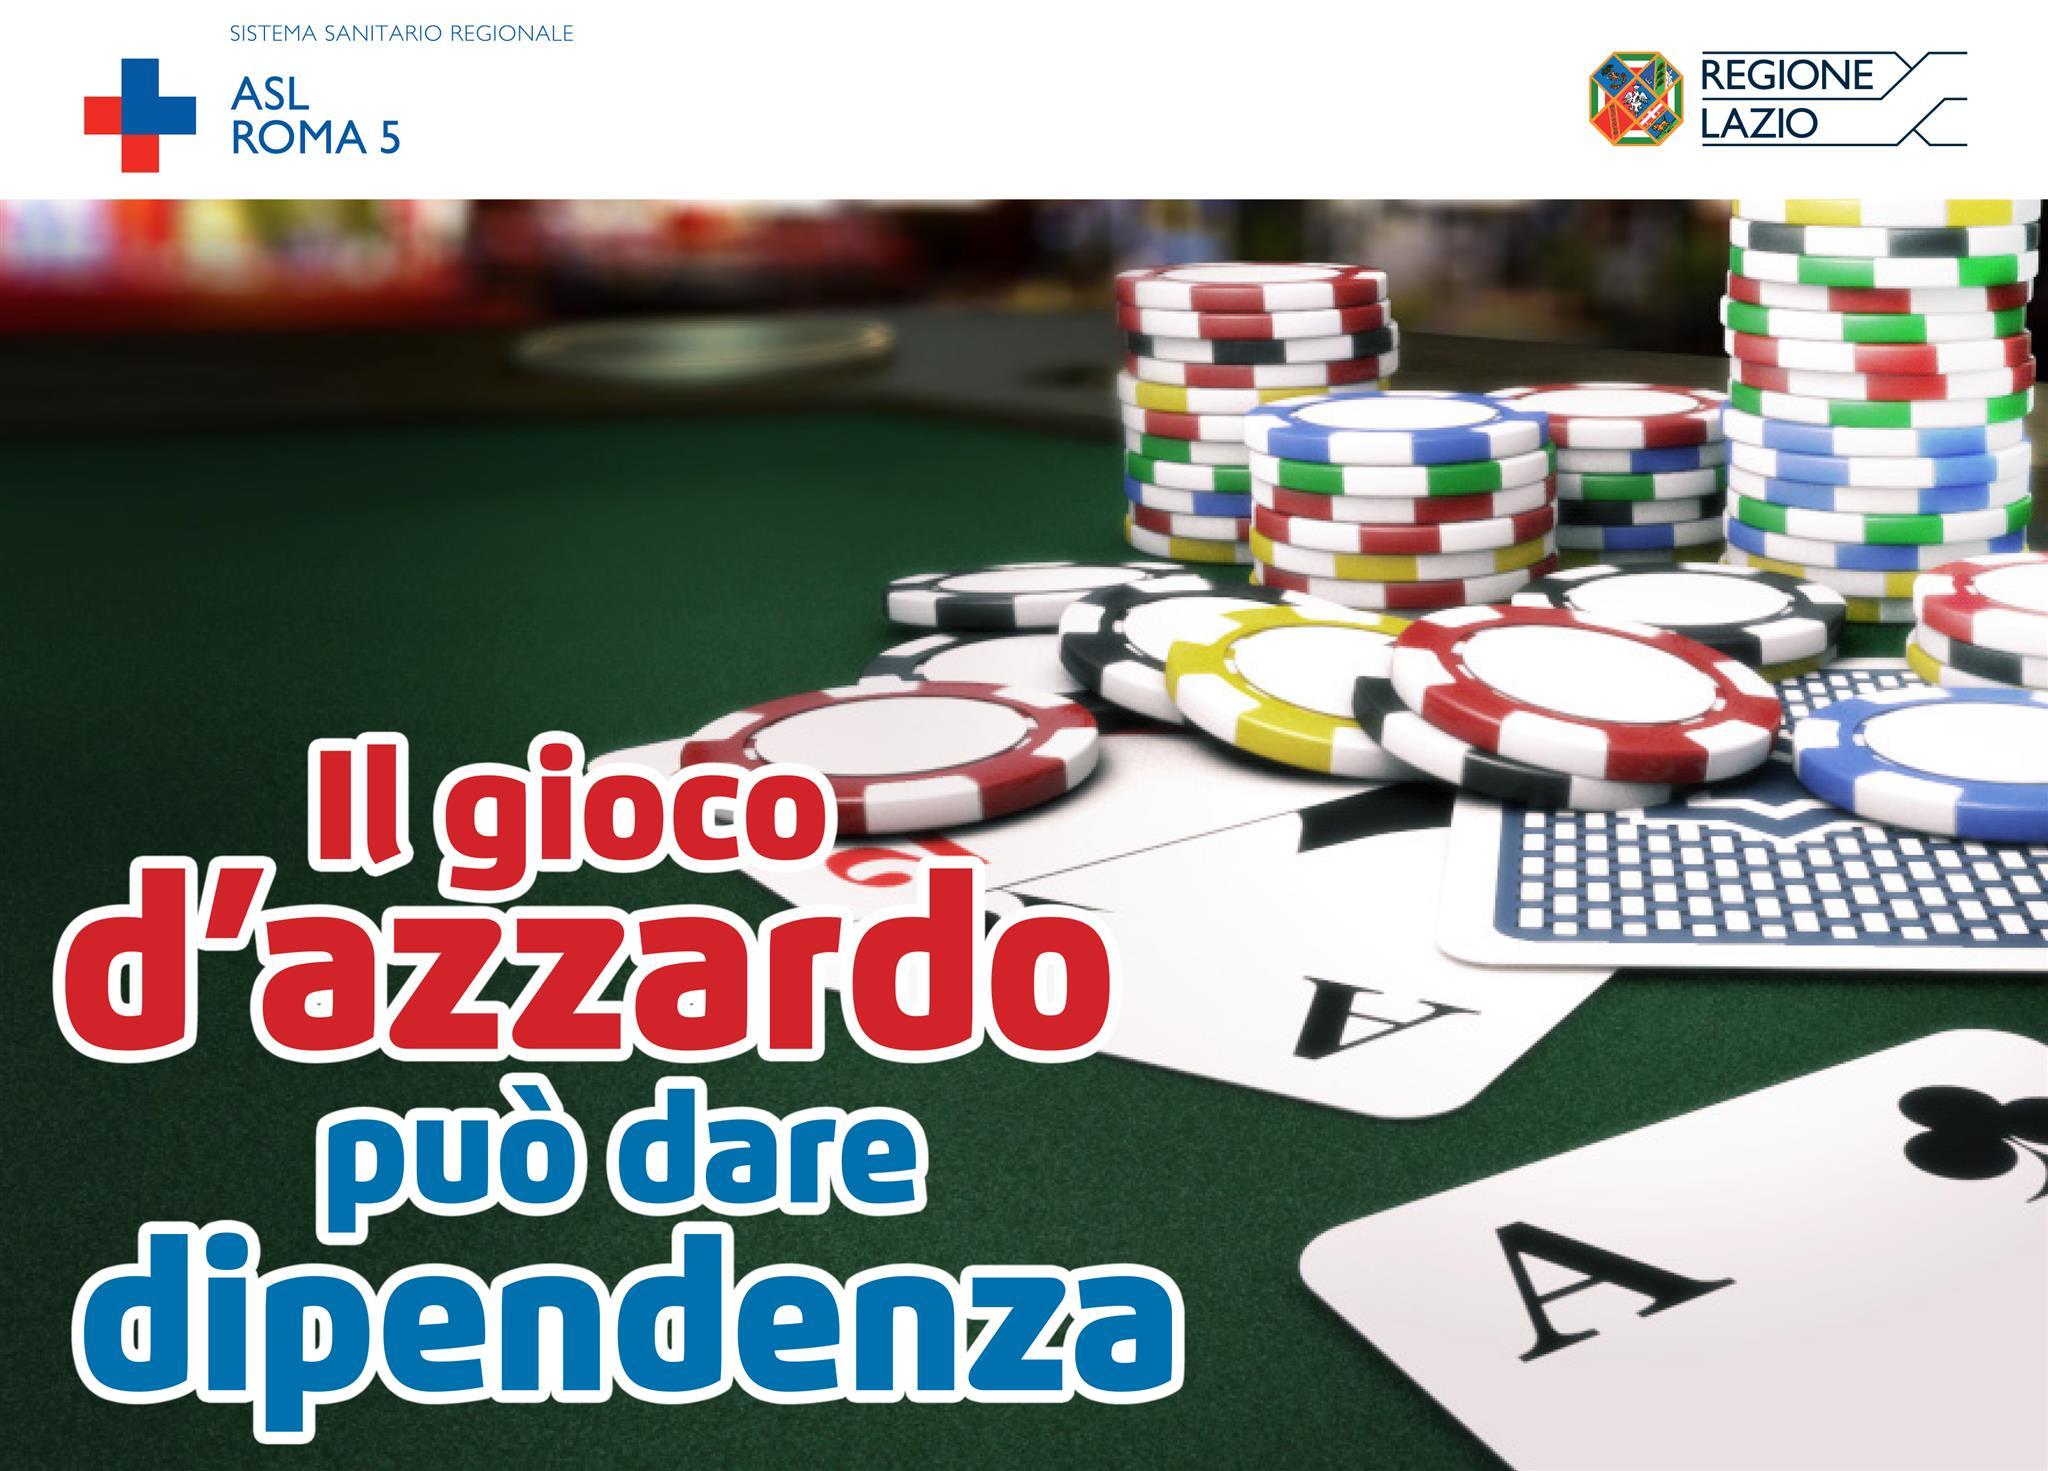 gioco d'azzardo dipendenza